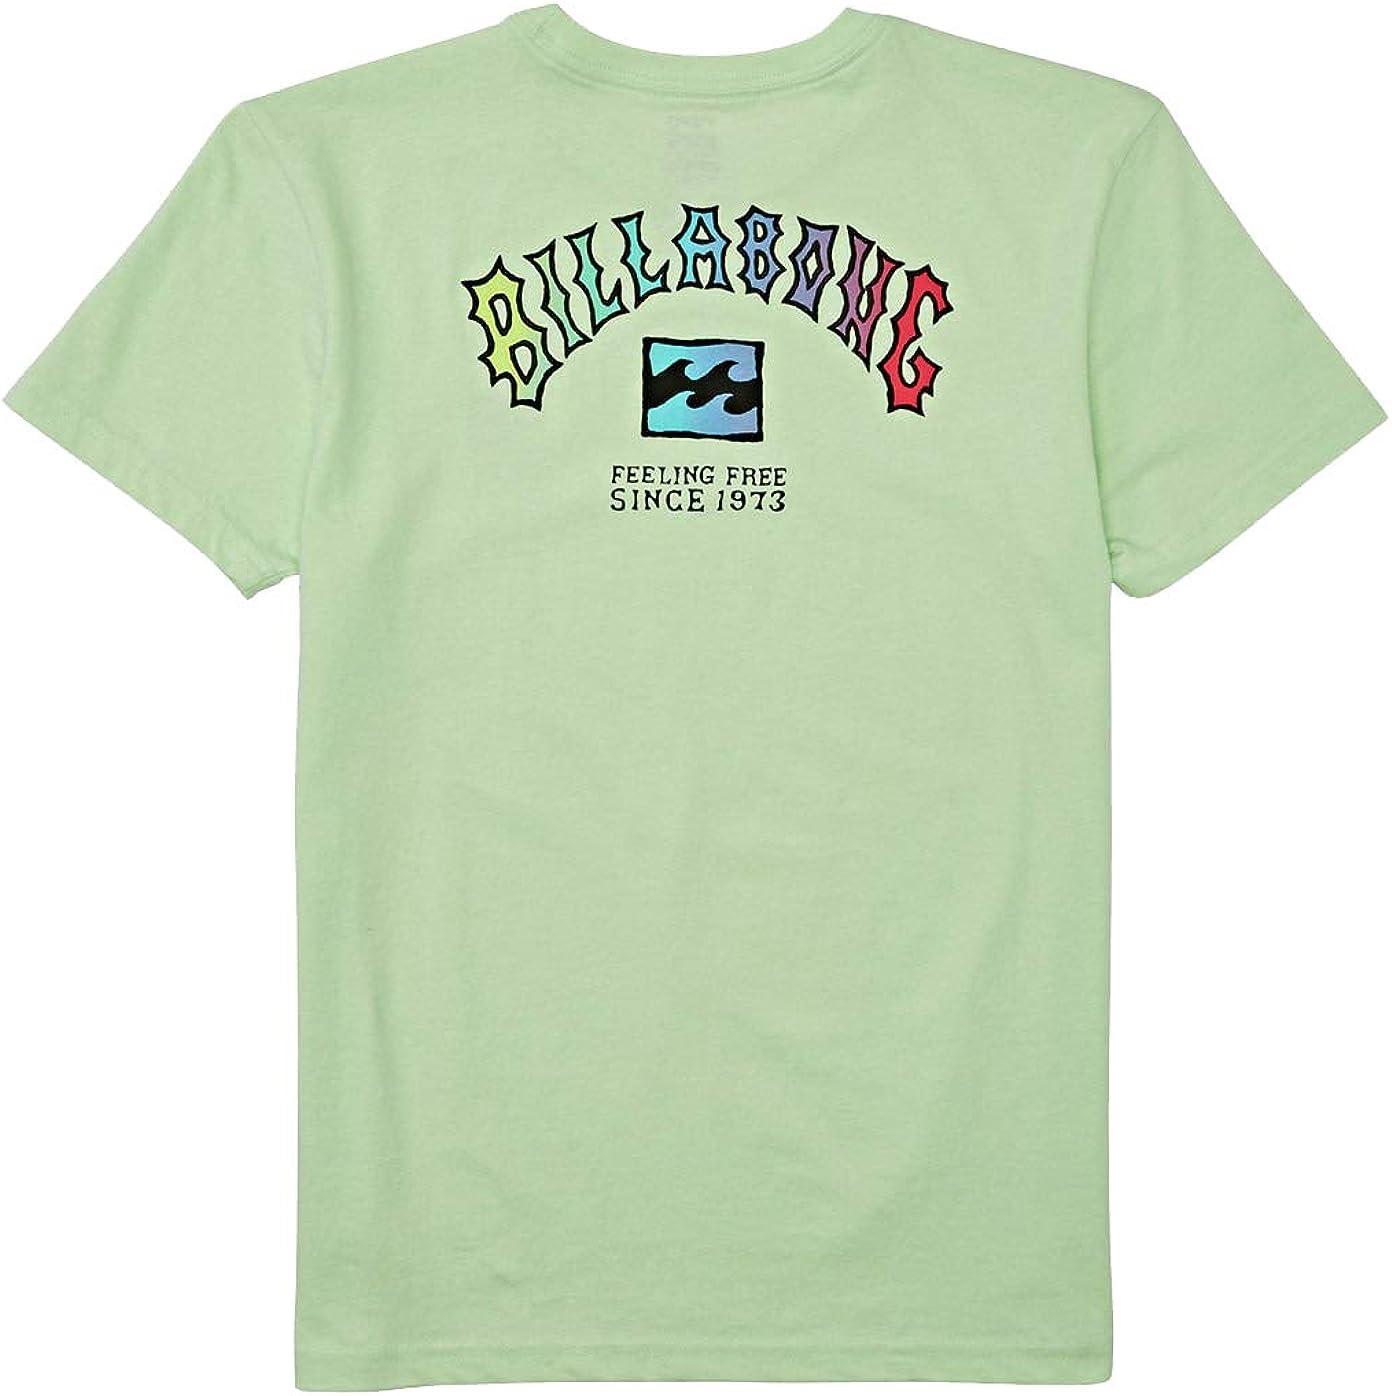 Billabong Boys Premium Short Sleeve Graphic Tee T-Shirt